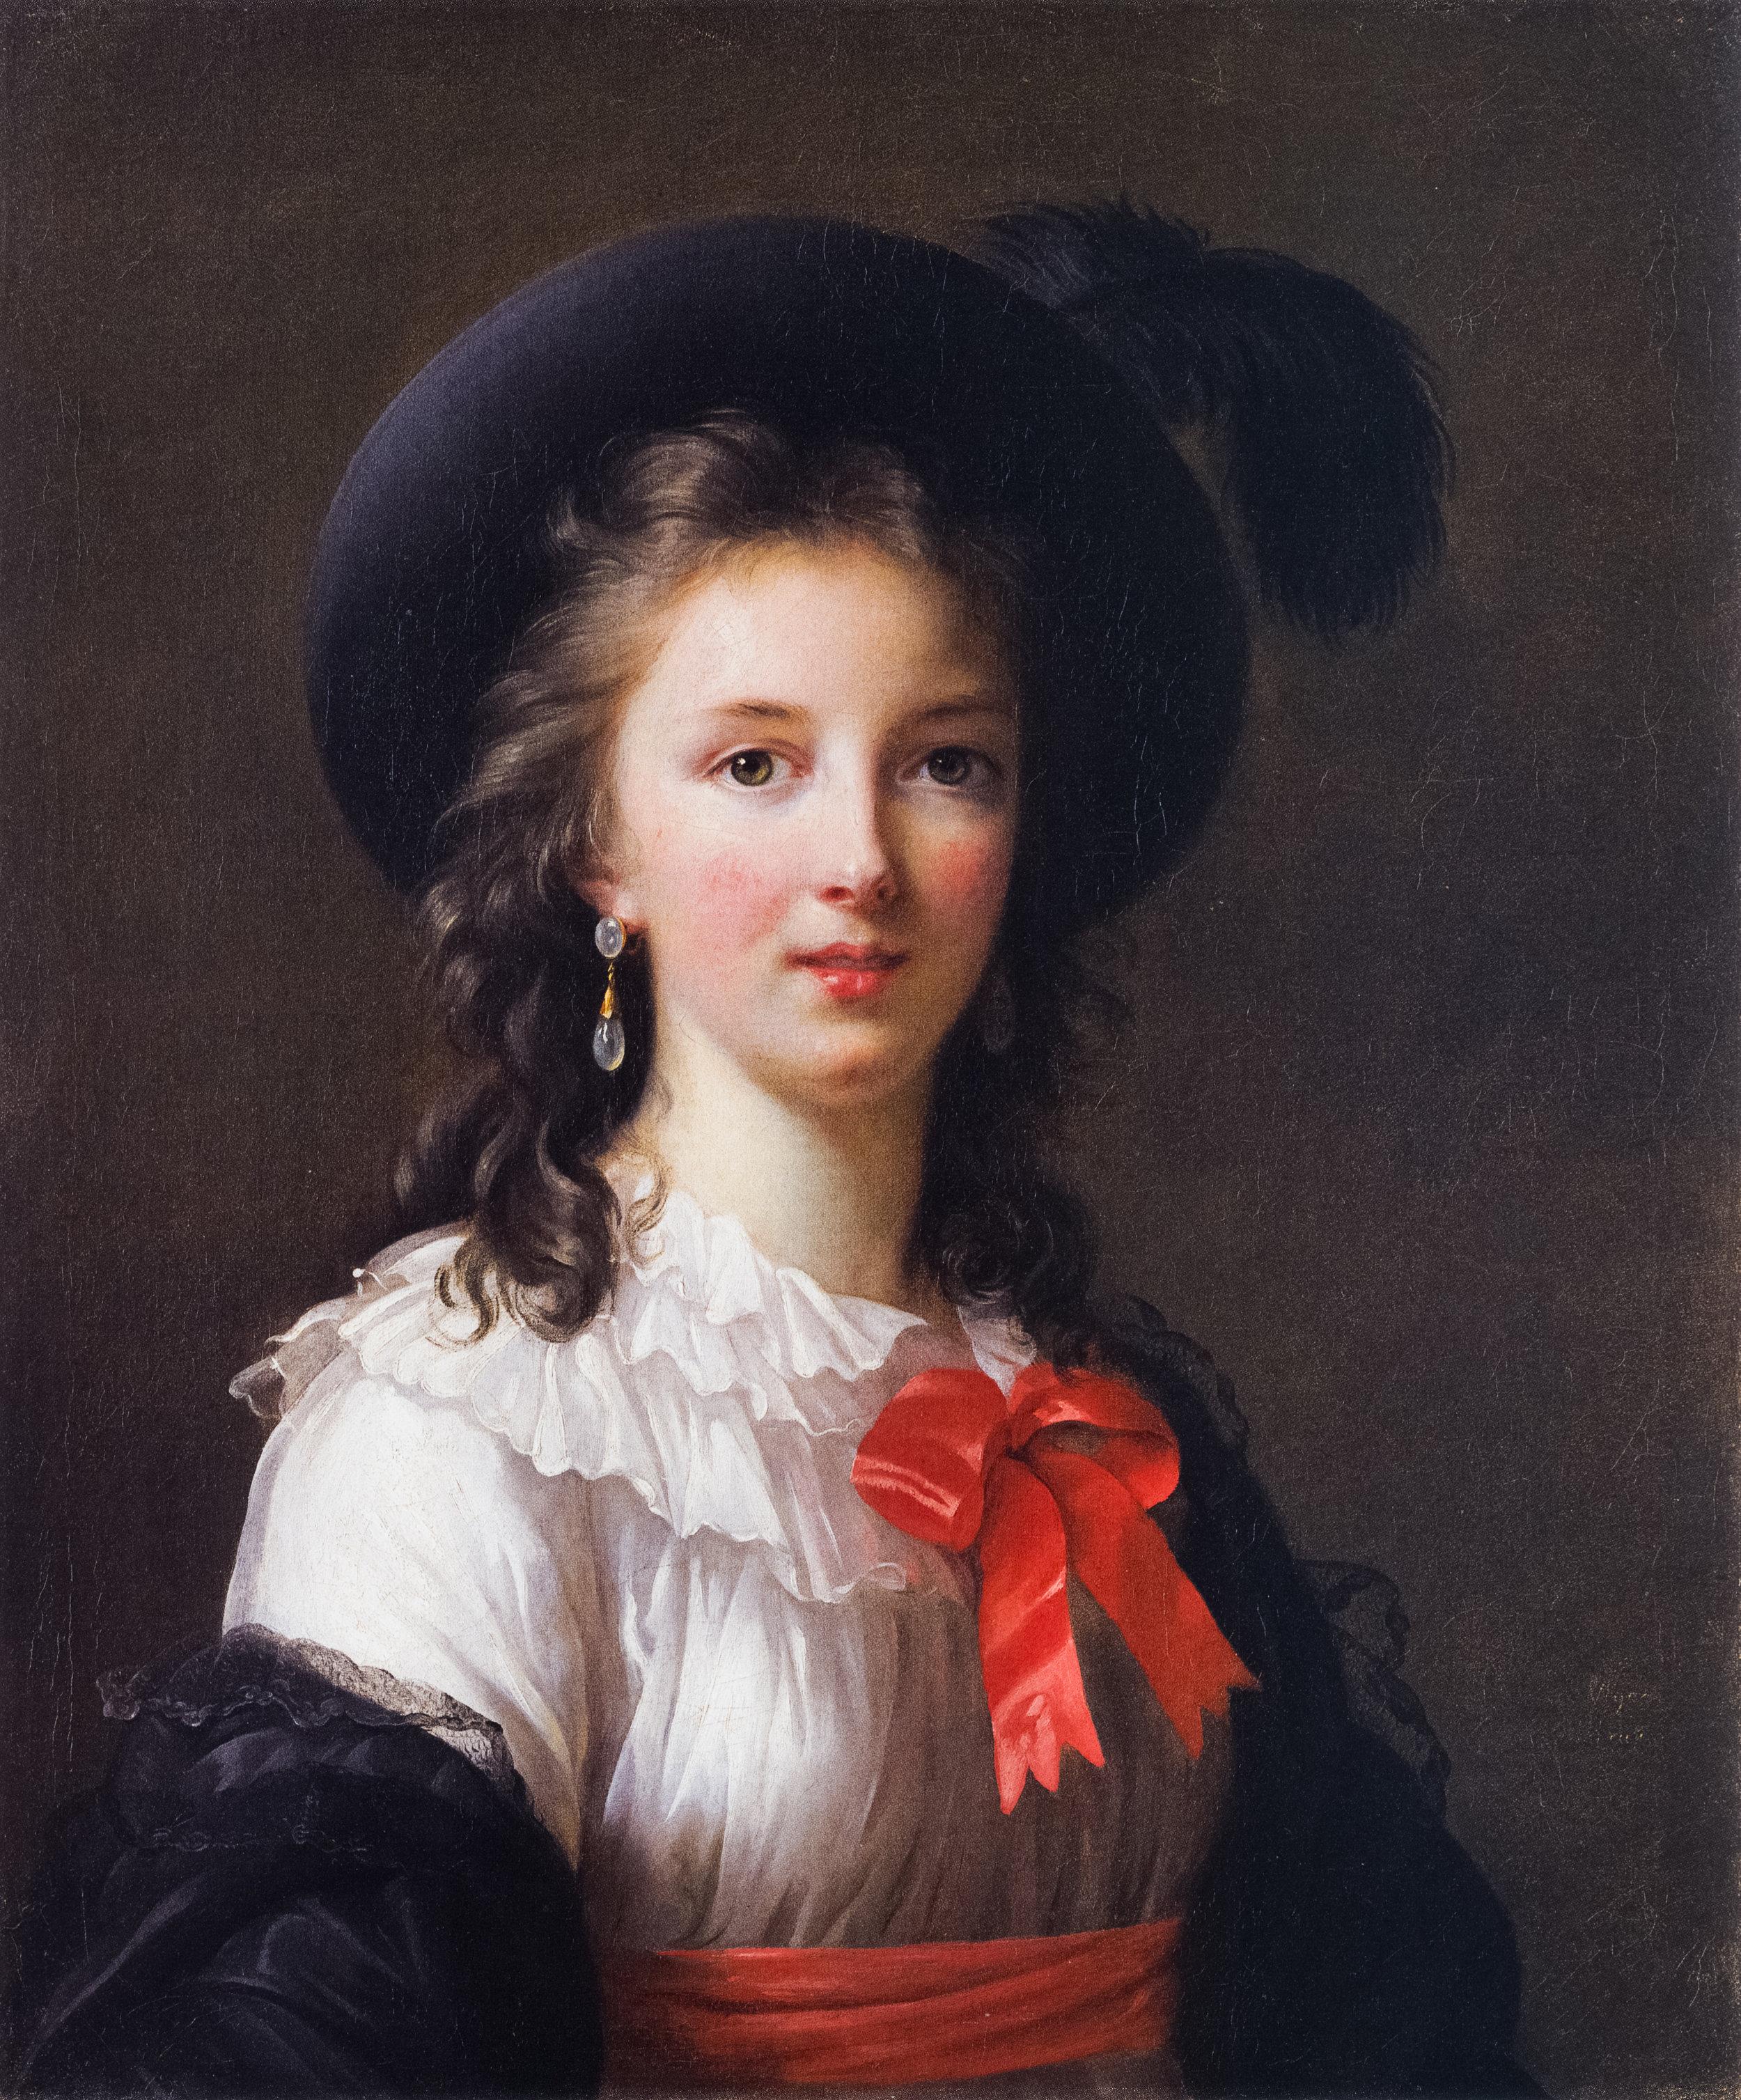 Elisabeth Vigeé Le Brun, Self-Portrait, circa 1781-1782, oil on canvas, Kimbell Art Museum